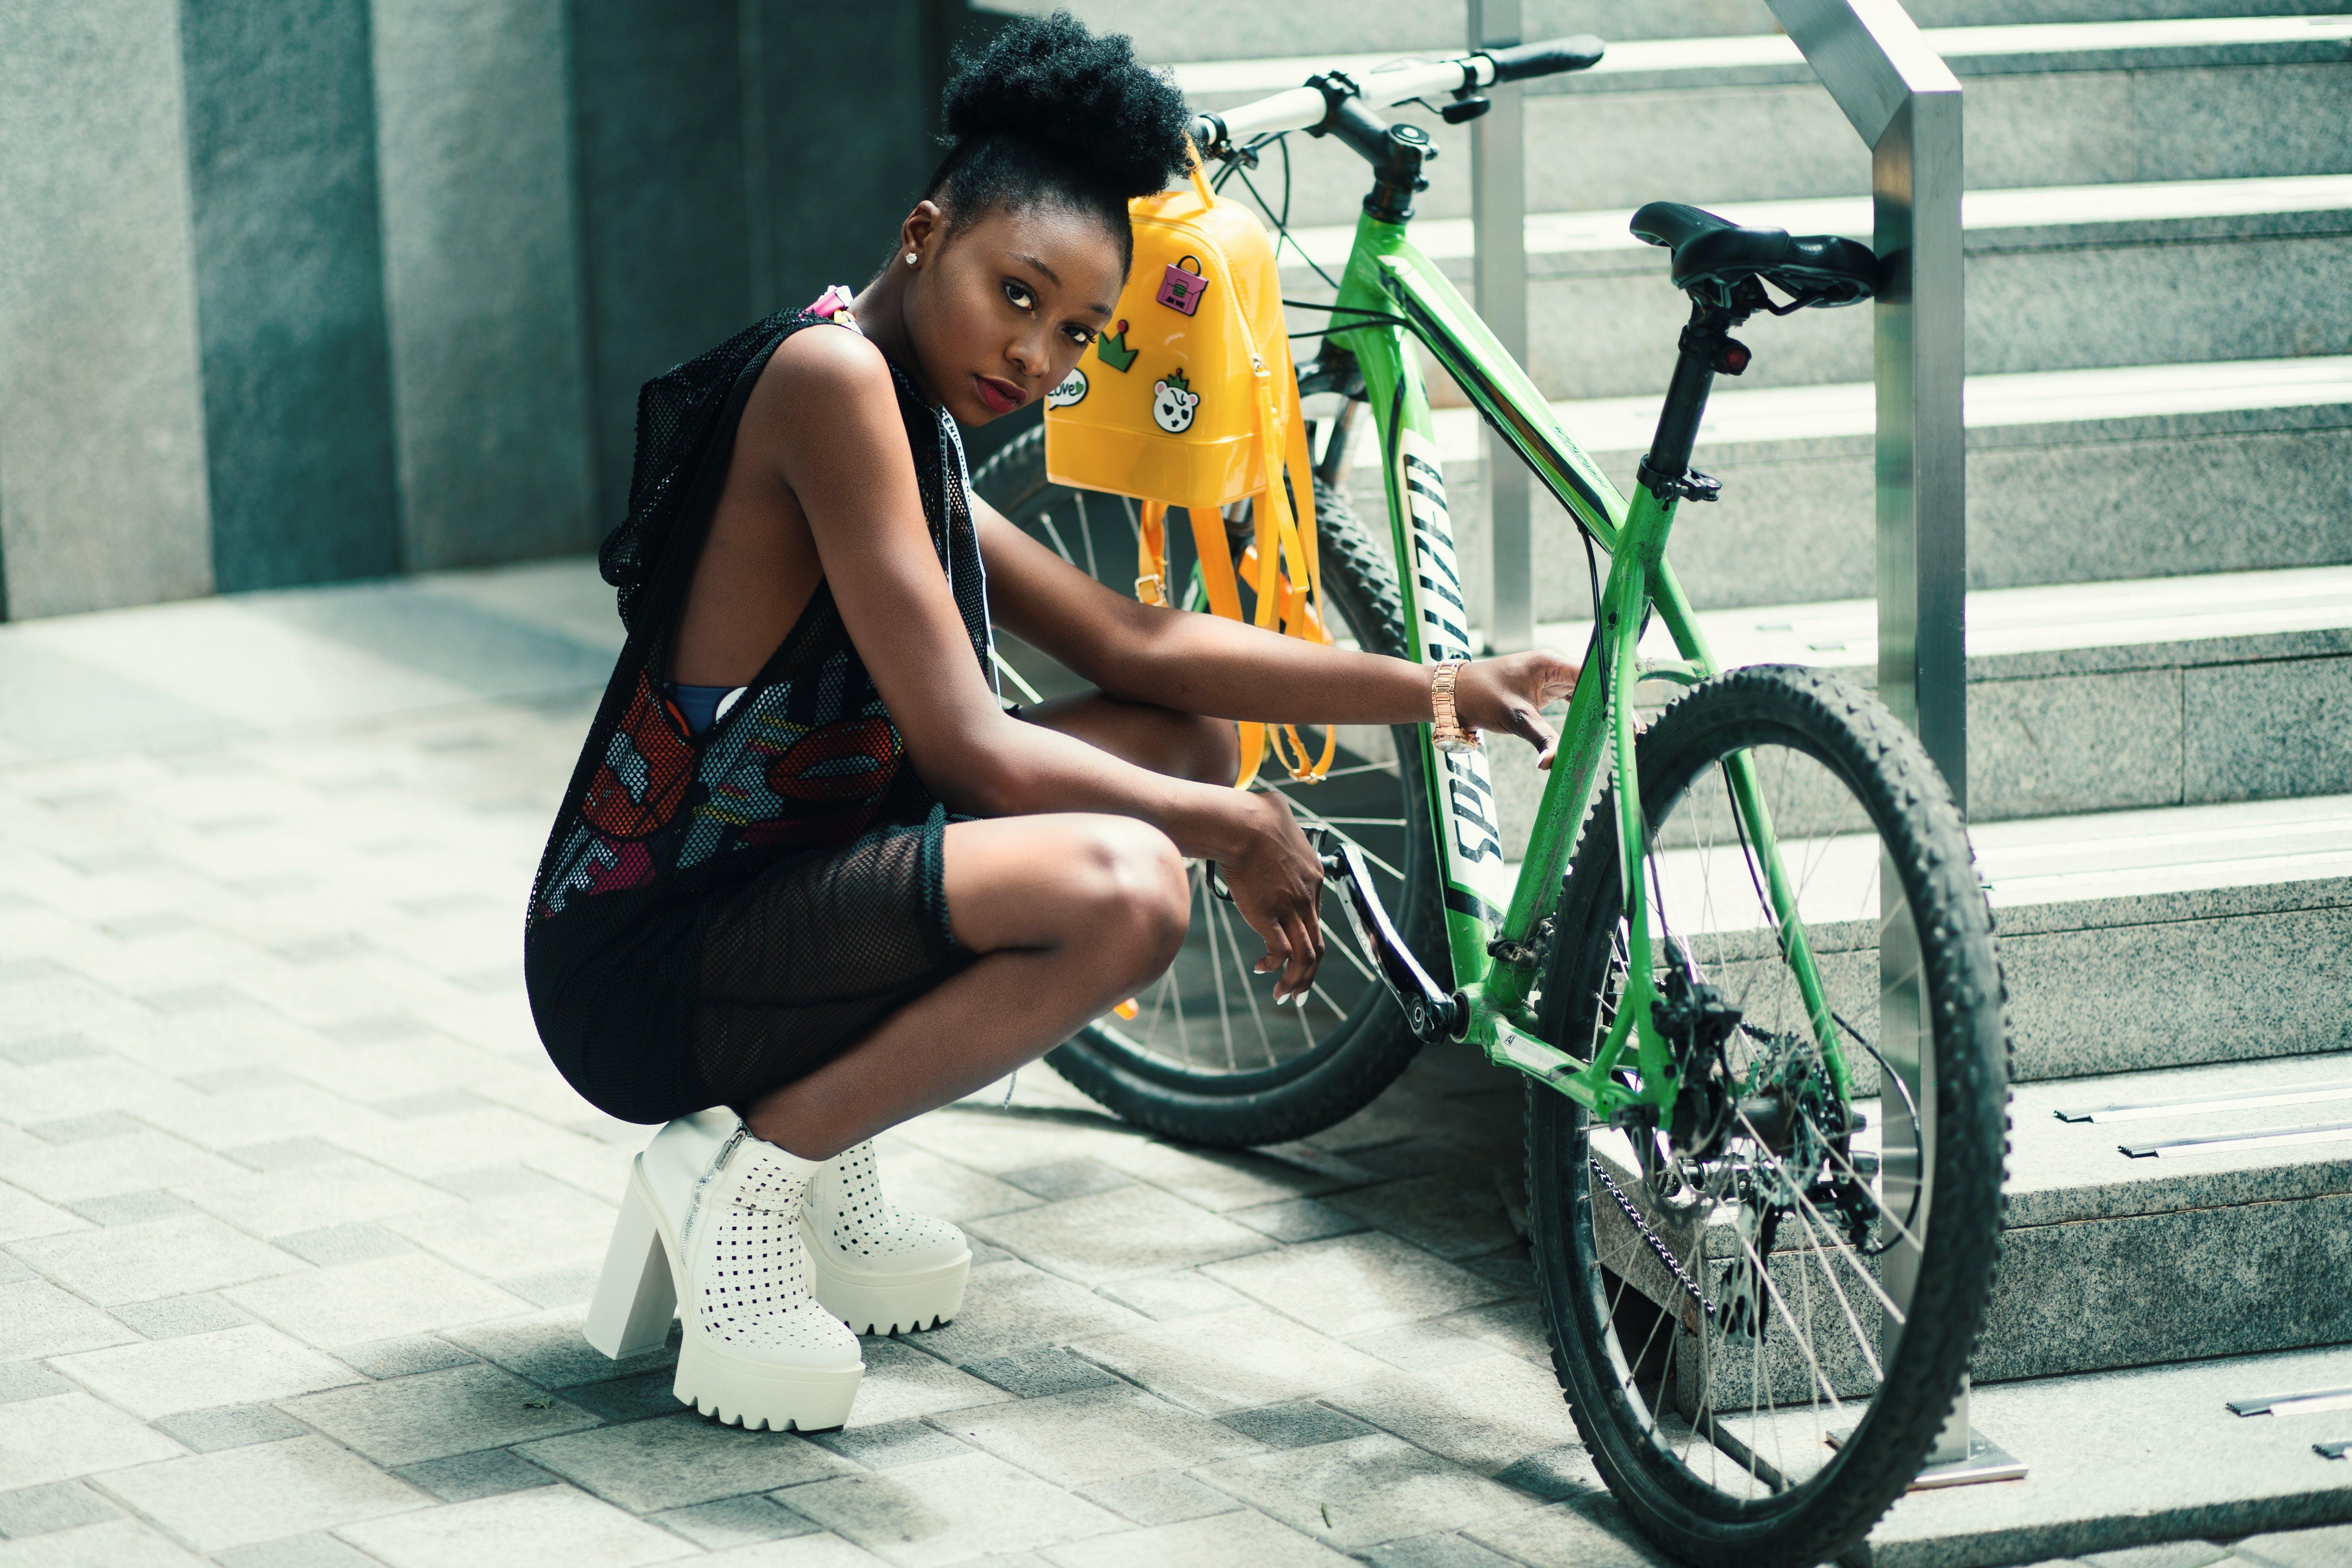 Woman Wearing Black Dress Seating Near Green Bicycle